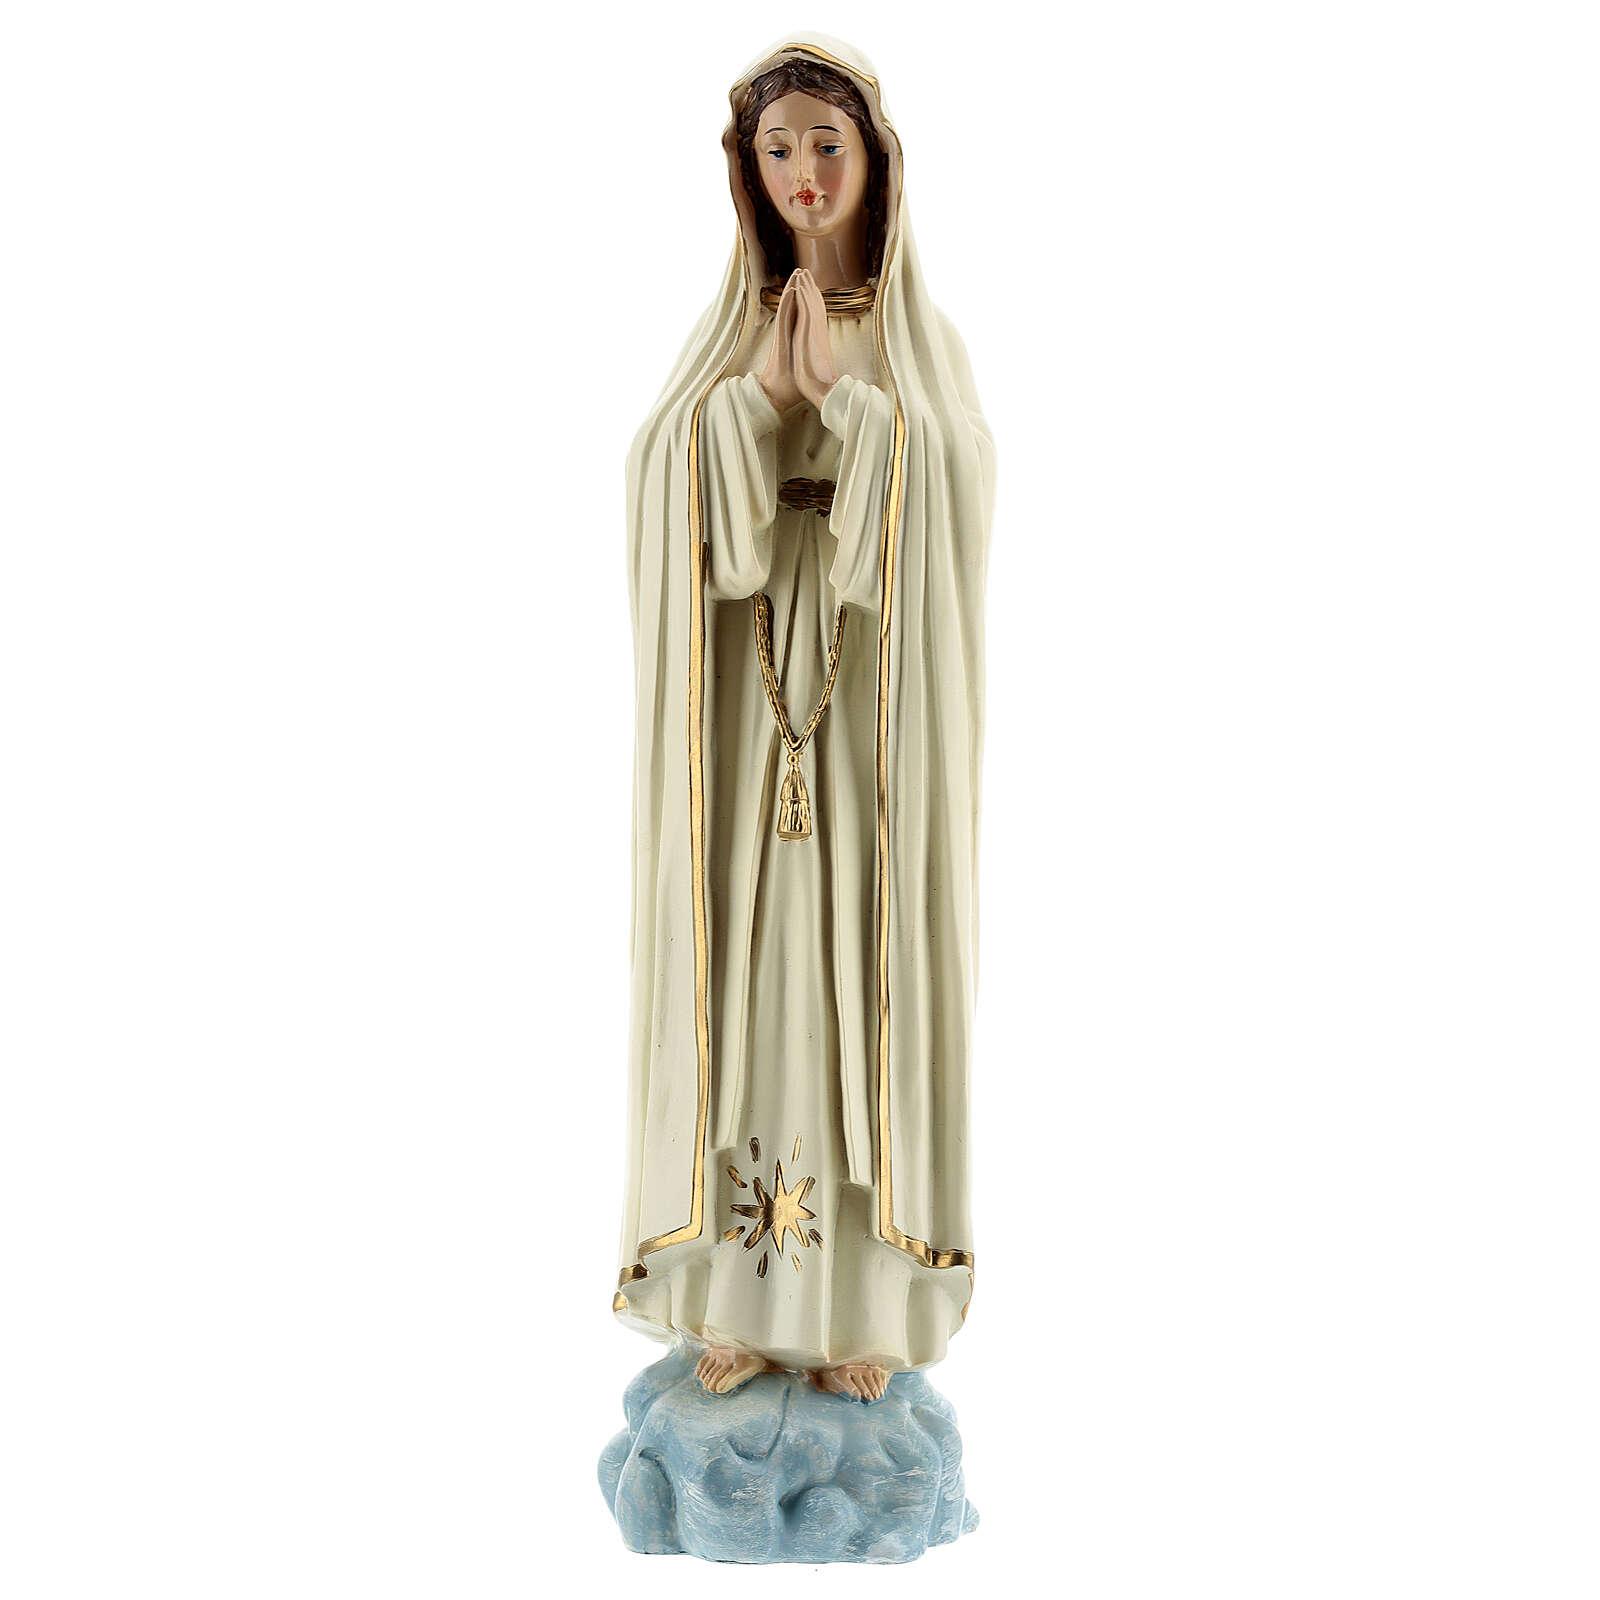 Estatua Virgen Fátima vestidos blancos sin corona resina 30 cm 4